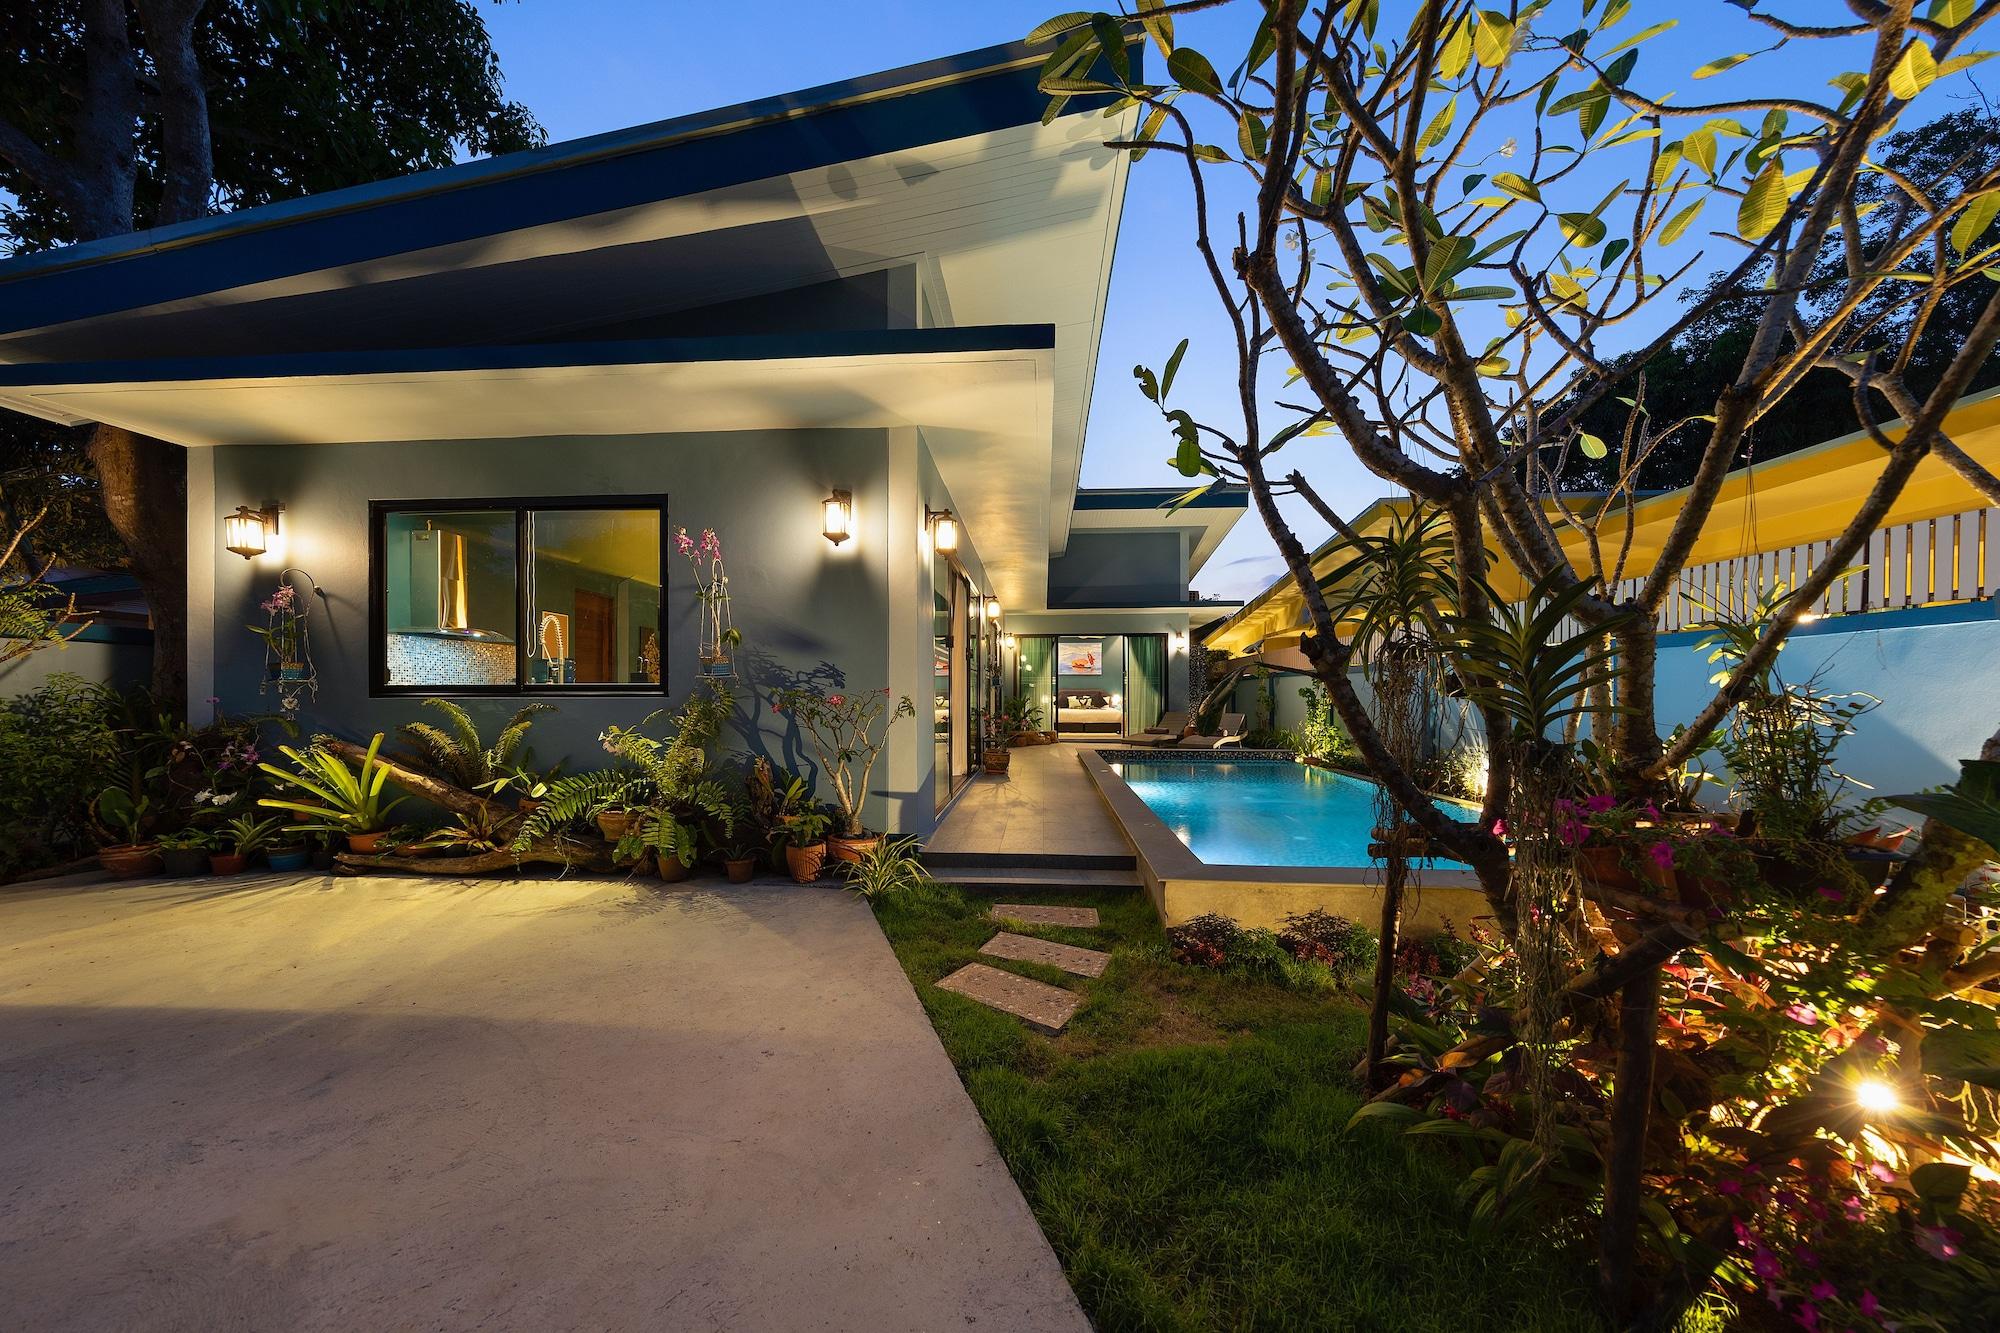 3-Bedroom Villa Baan Kluay Mai with Private Pool, Ko Samui